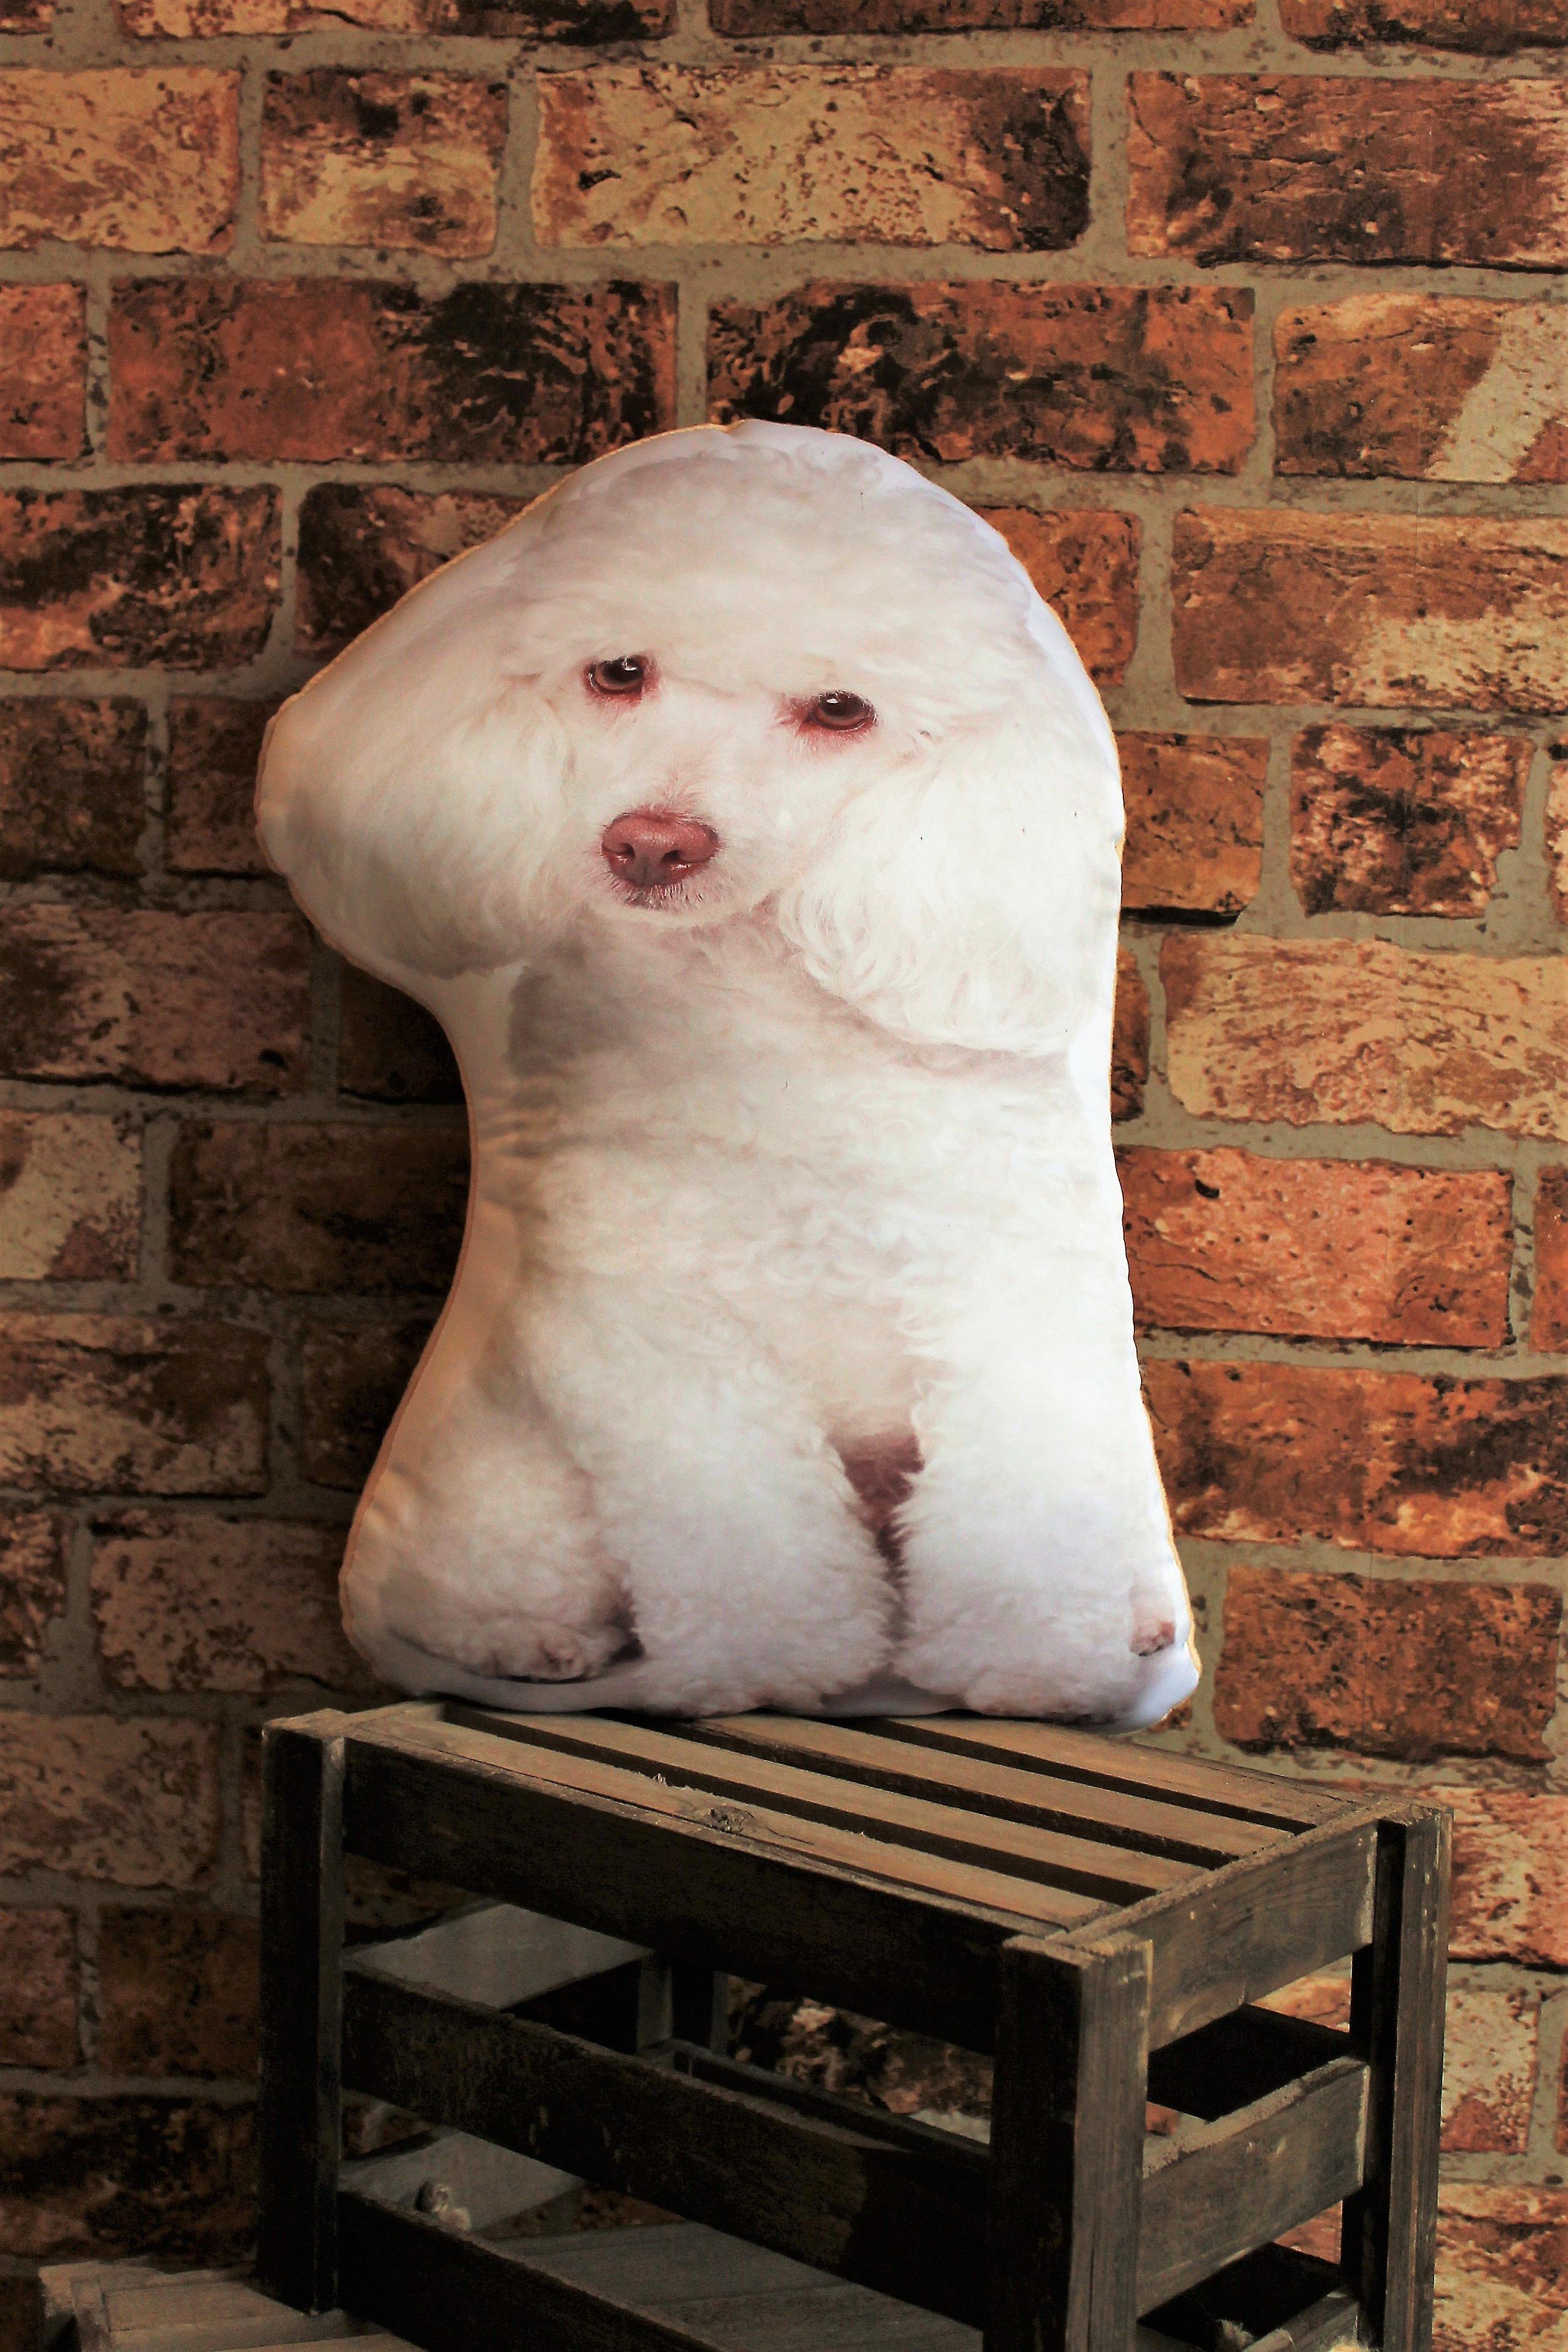 Adorable white poodle shaped cushion